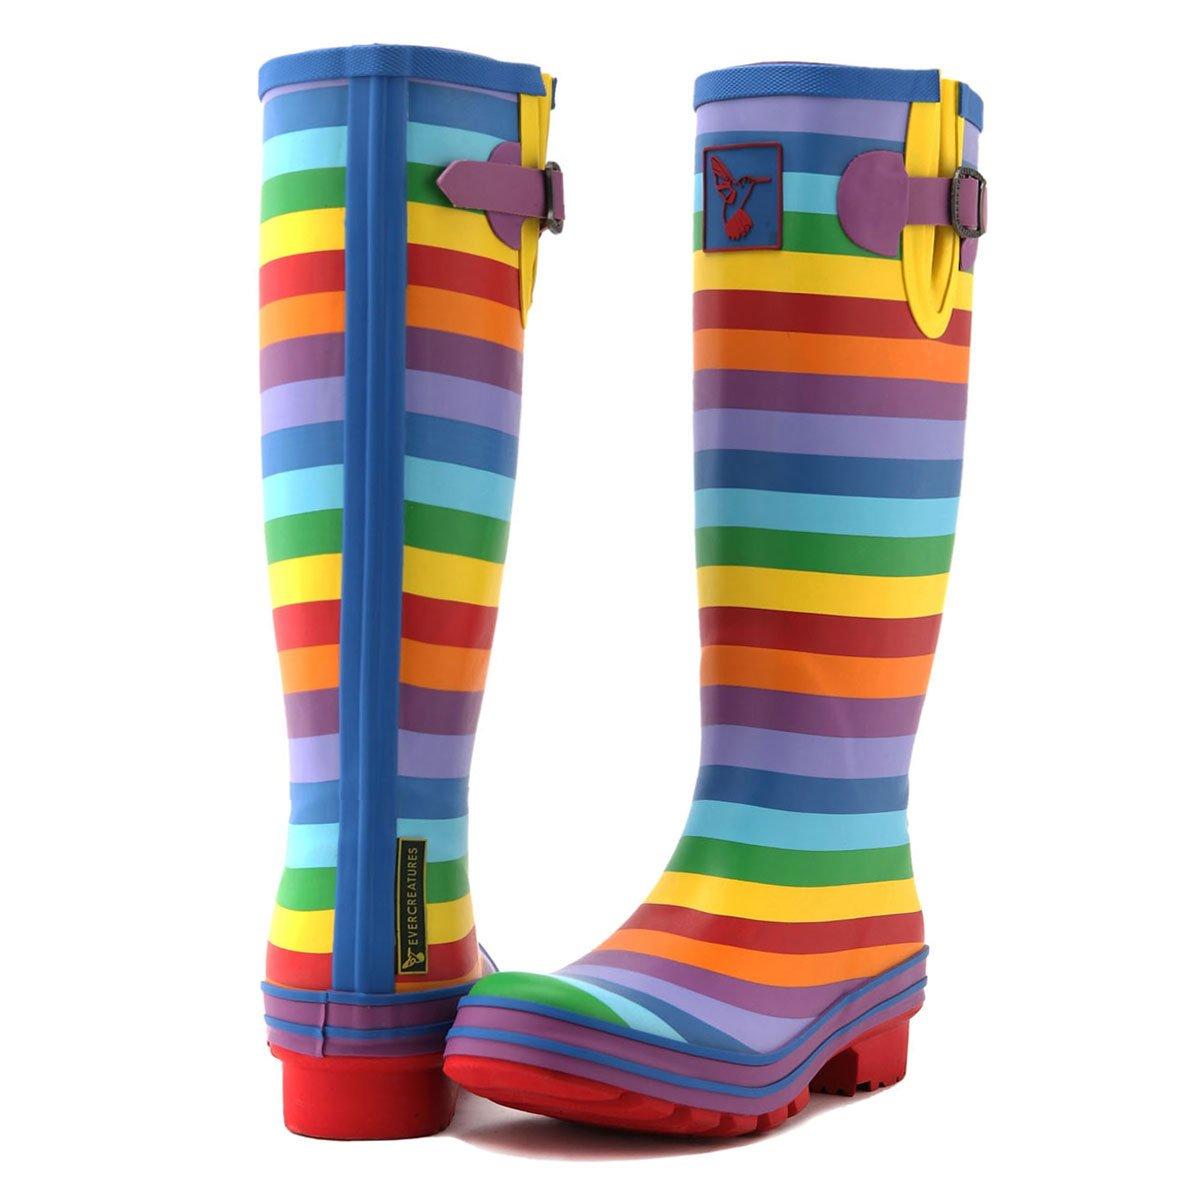 Evercreatures Women's Rain Boots UK Brand Original Tall Rain Boot B(M) Gumboots Wellies B008DS6IZM 10 B(M) Boot US / UK8 / EU41|Multicolour 14f5a7